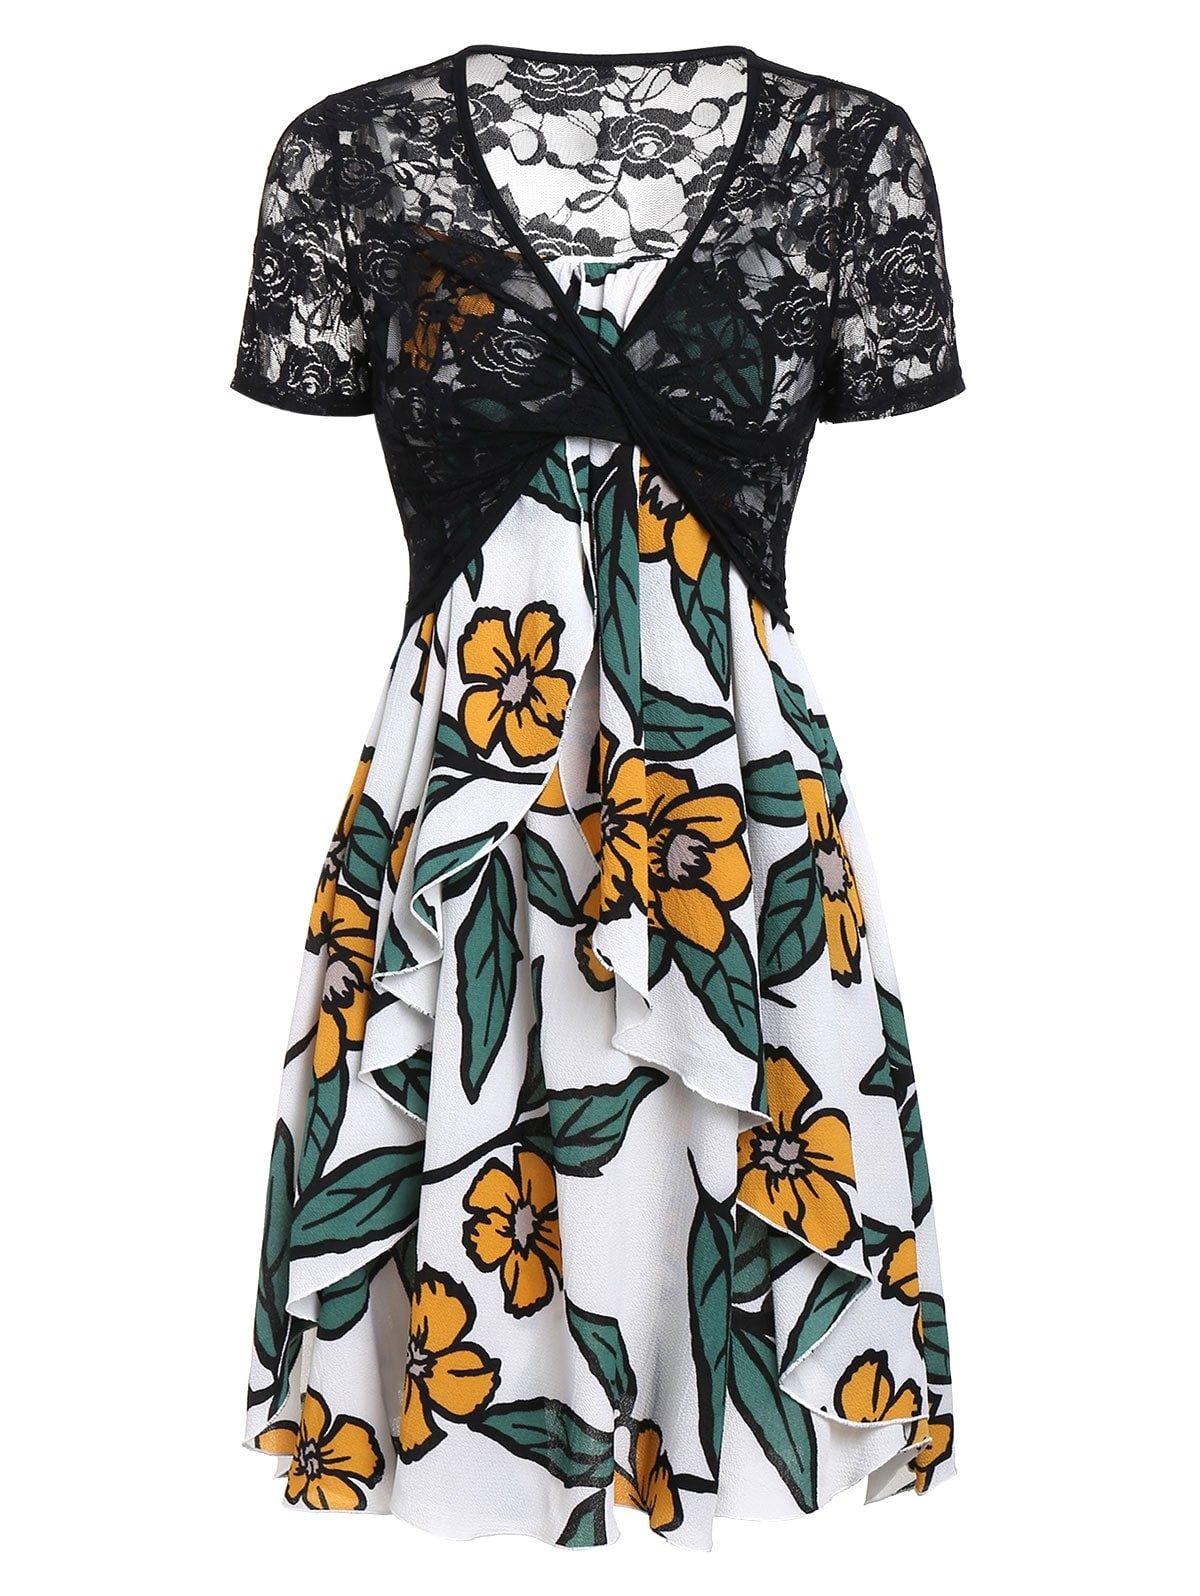 Dresslily Com Photo Gallery Flower Cami Draped Dress And Lace T Shirt Set Casual Dresses For Women Casual Dresses Cami Dress